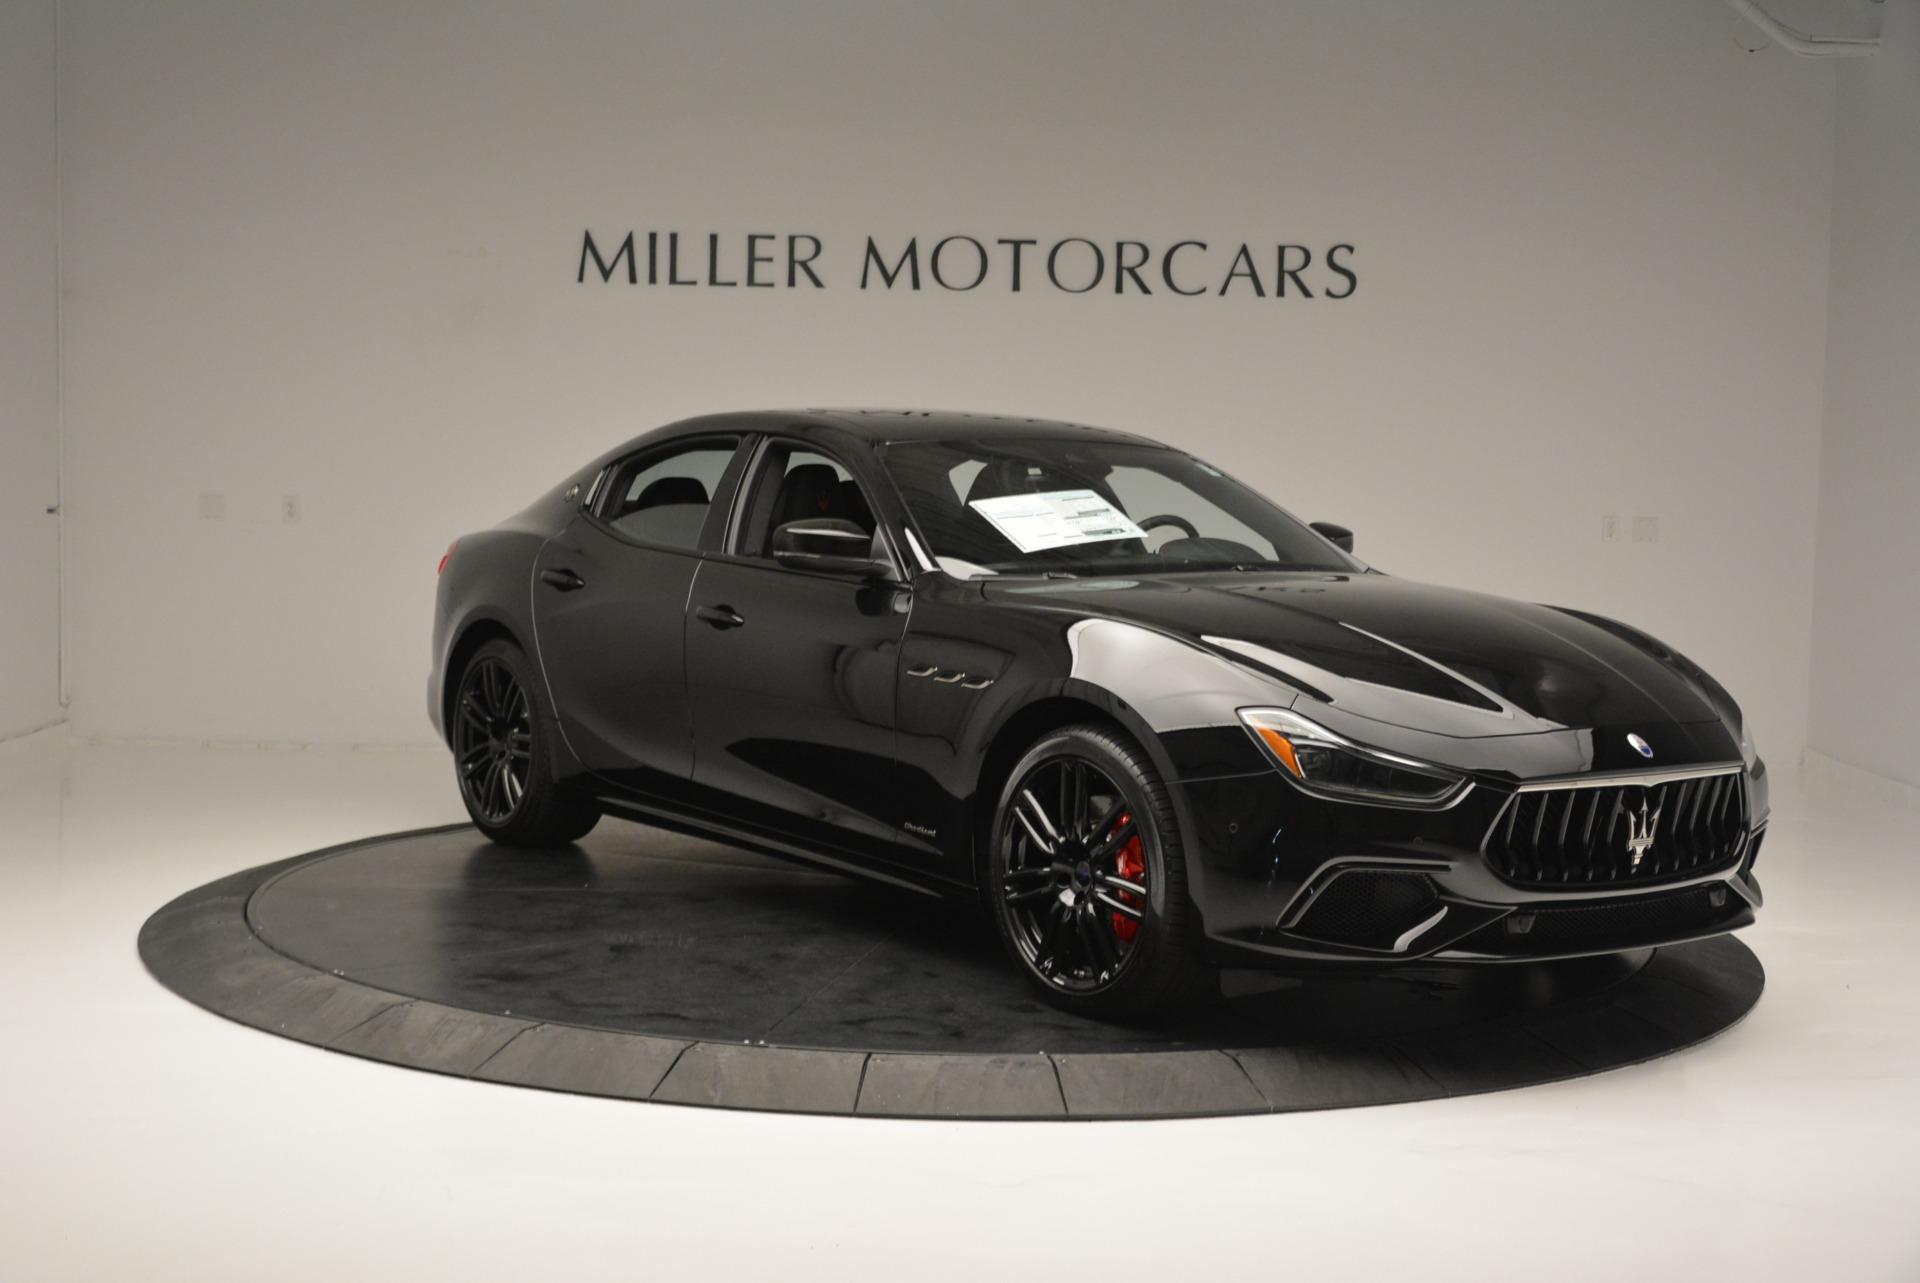 New 2018 Maserati Ghibli SQ4 GranSport Nerissimo For Sale In Westport, CT 2278_p11